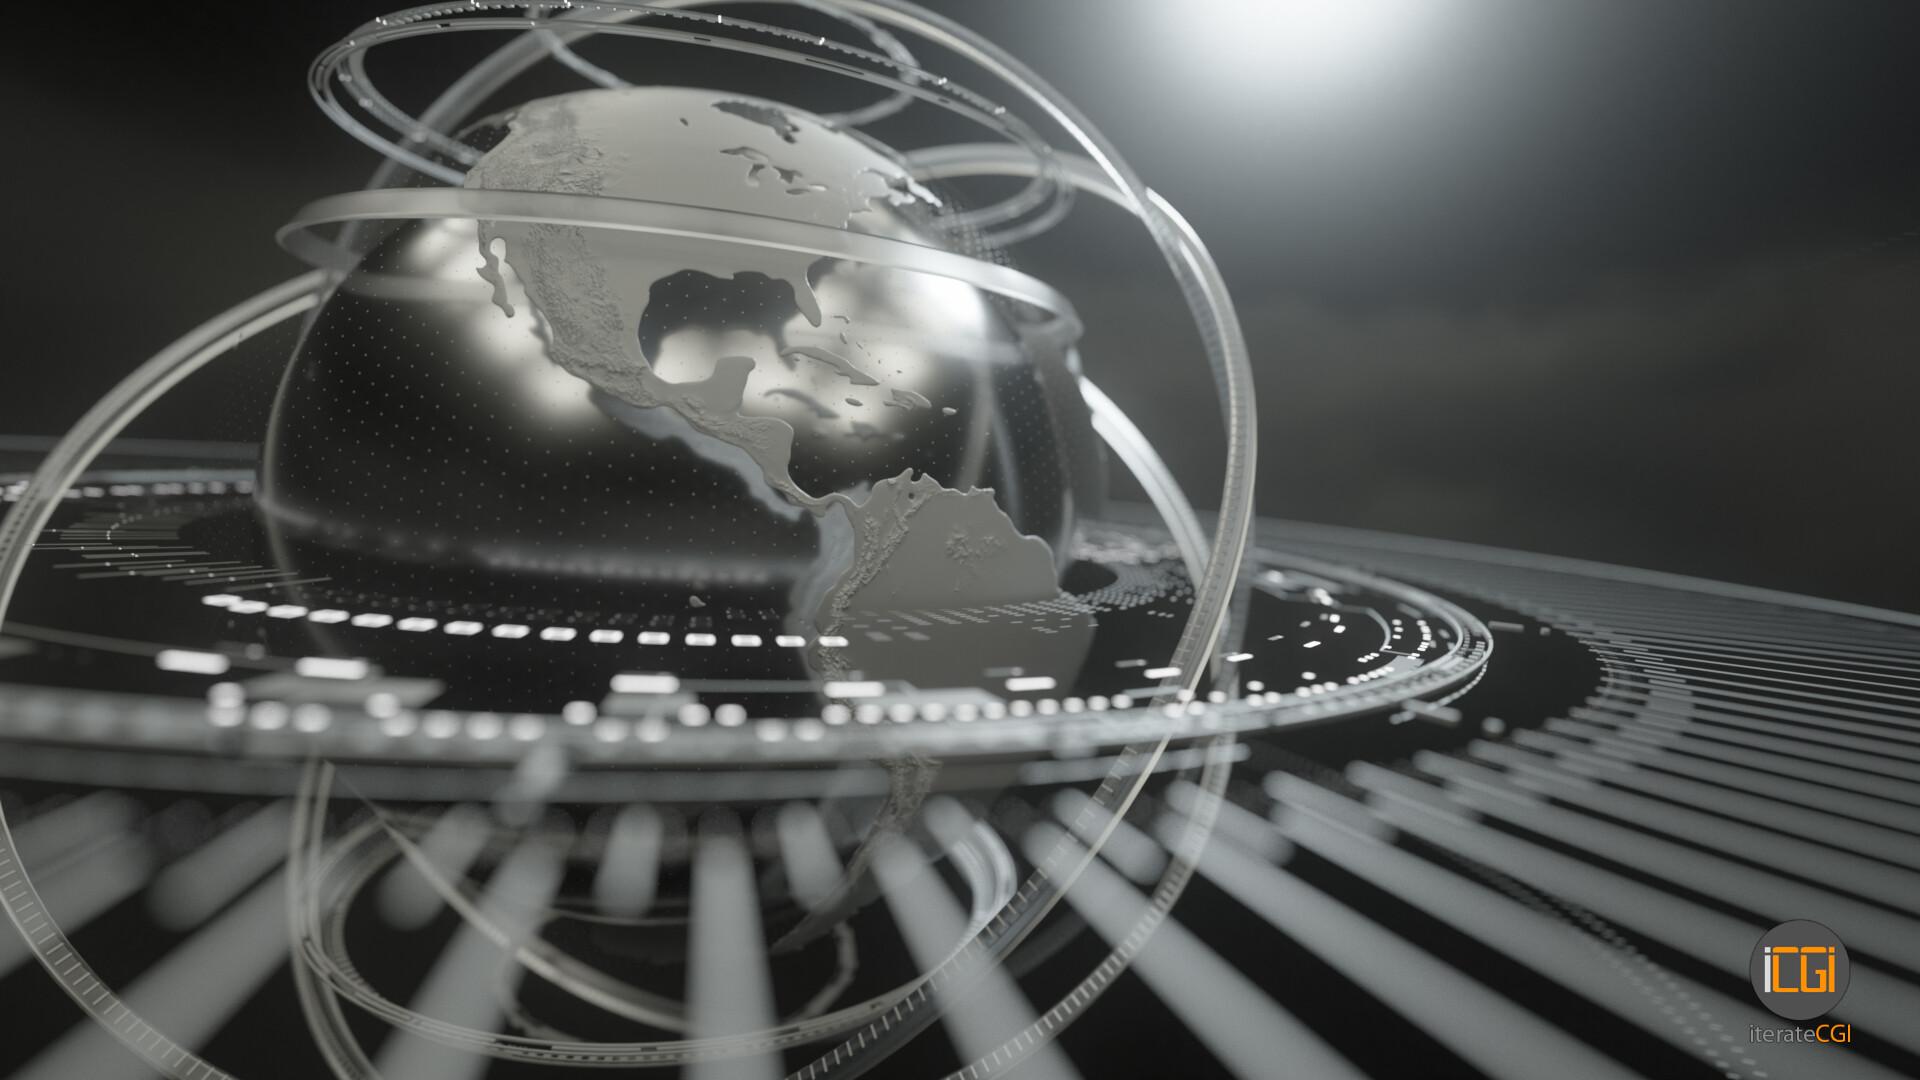 Johan de leenheer globe motion graphic 2